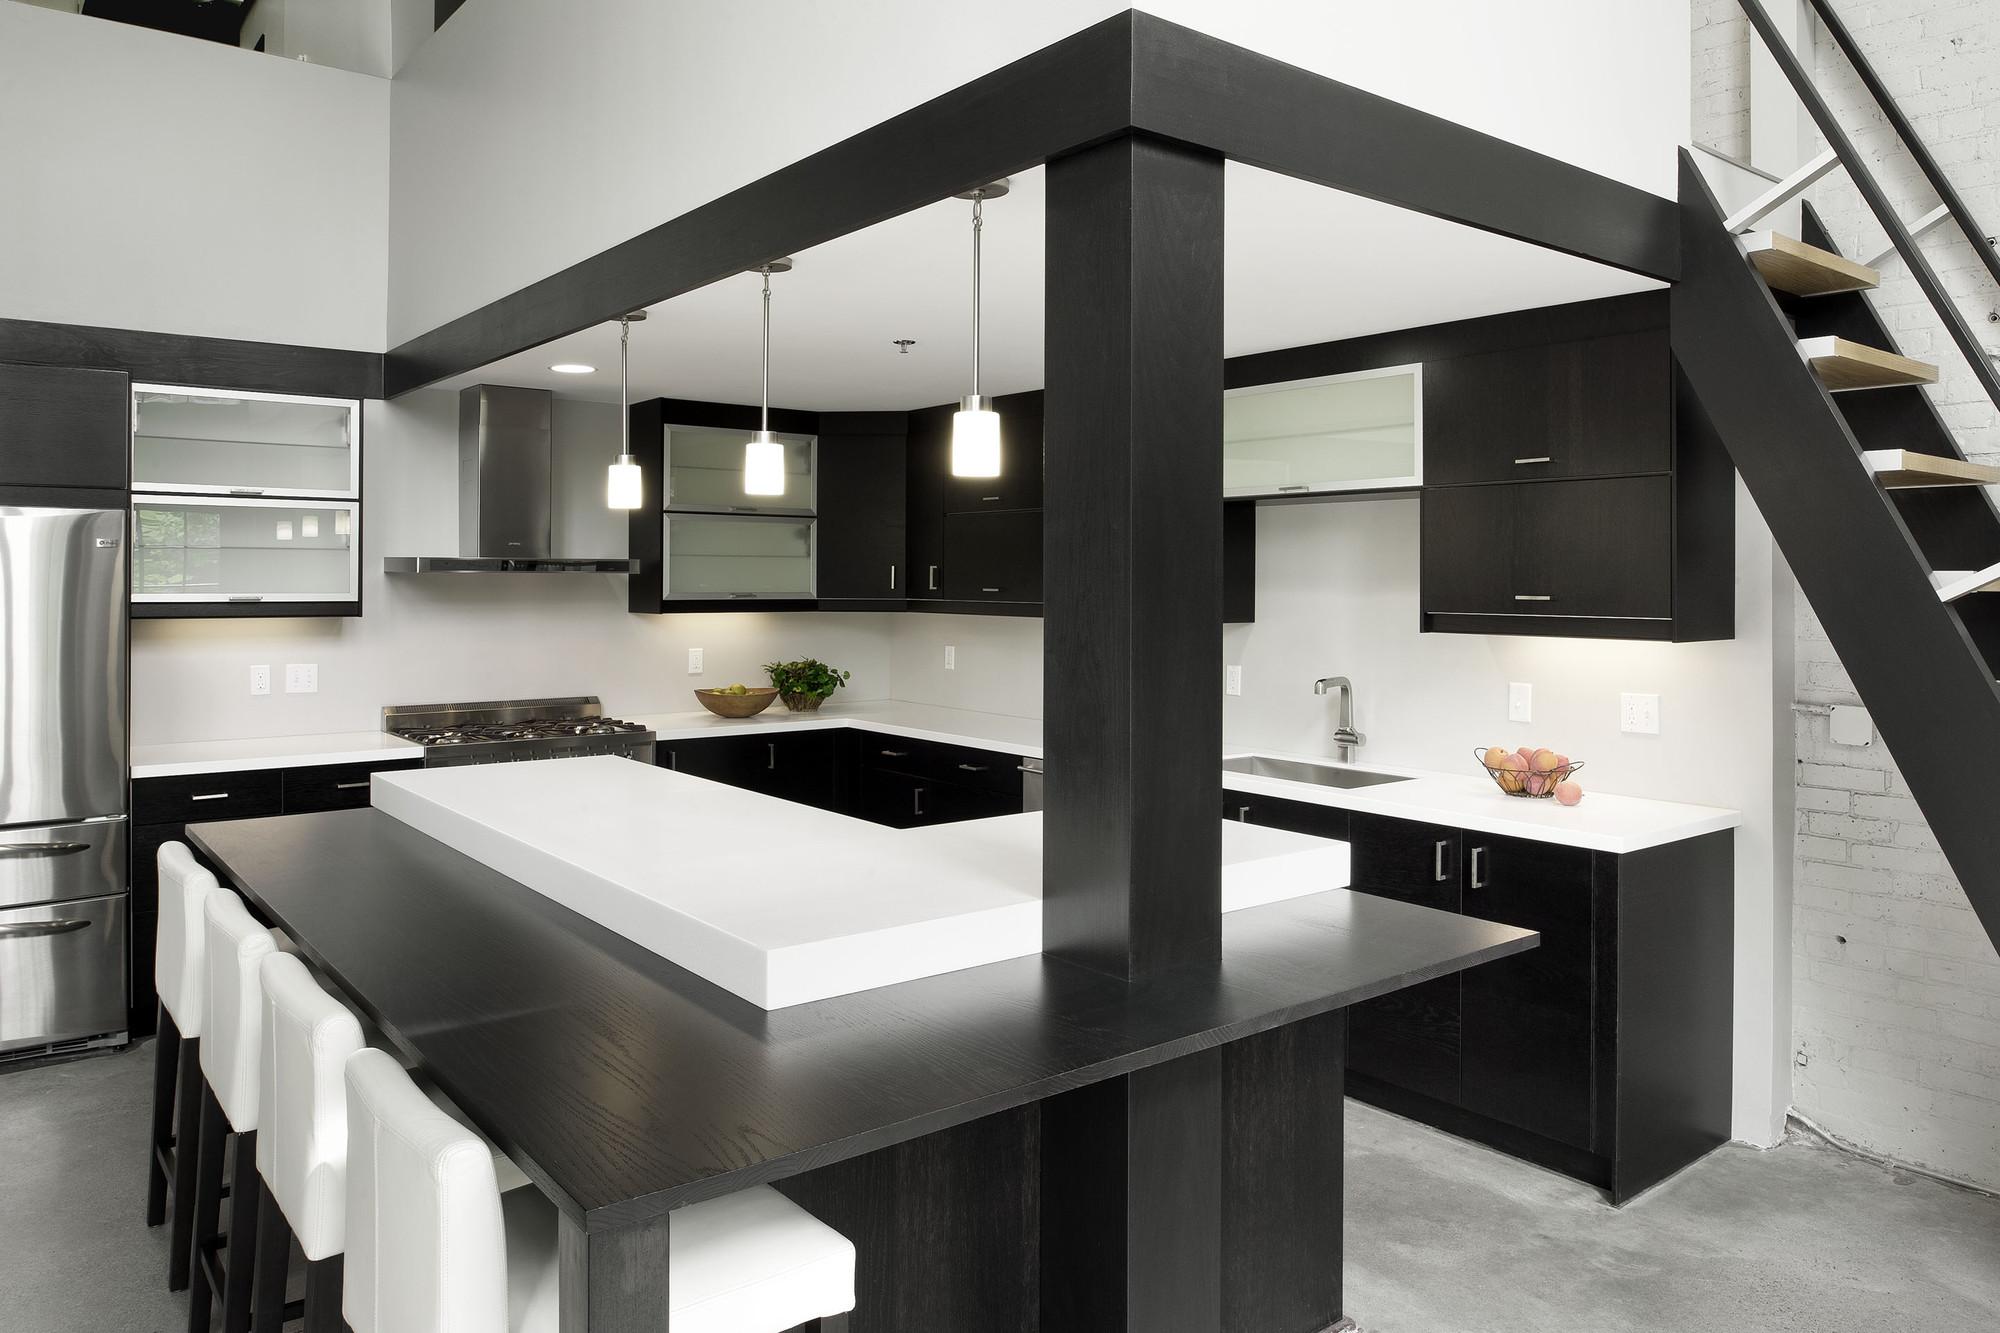 Split Level Homes Gallery Of Delin Boiler Room Stack Co 6